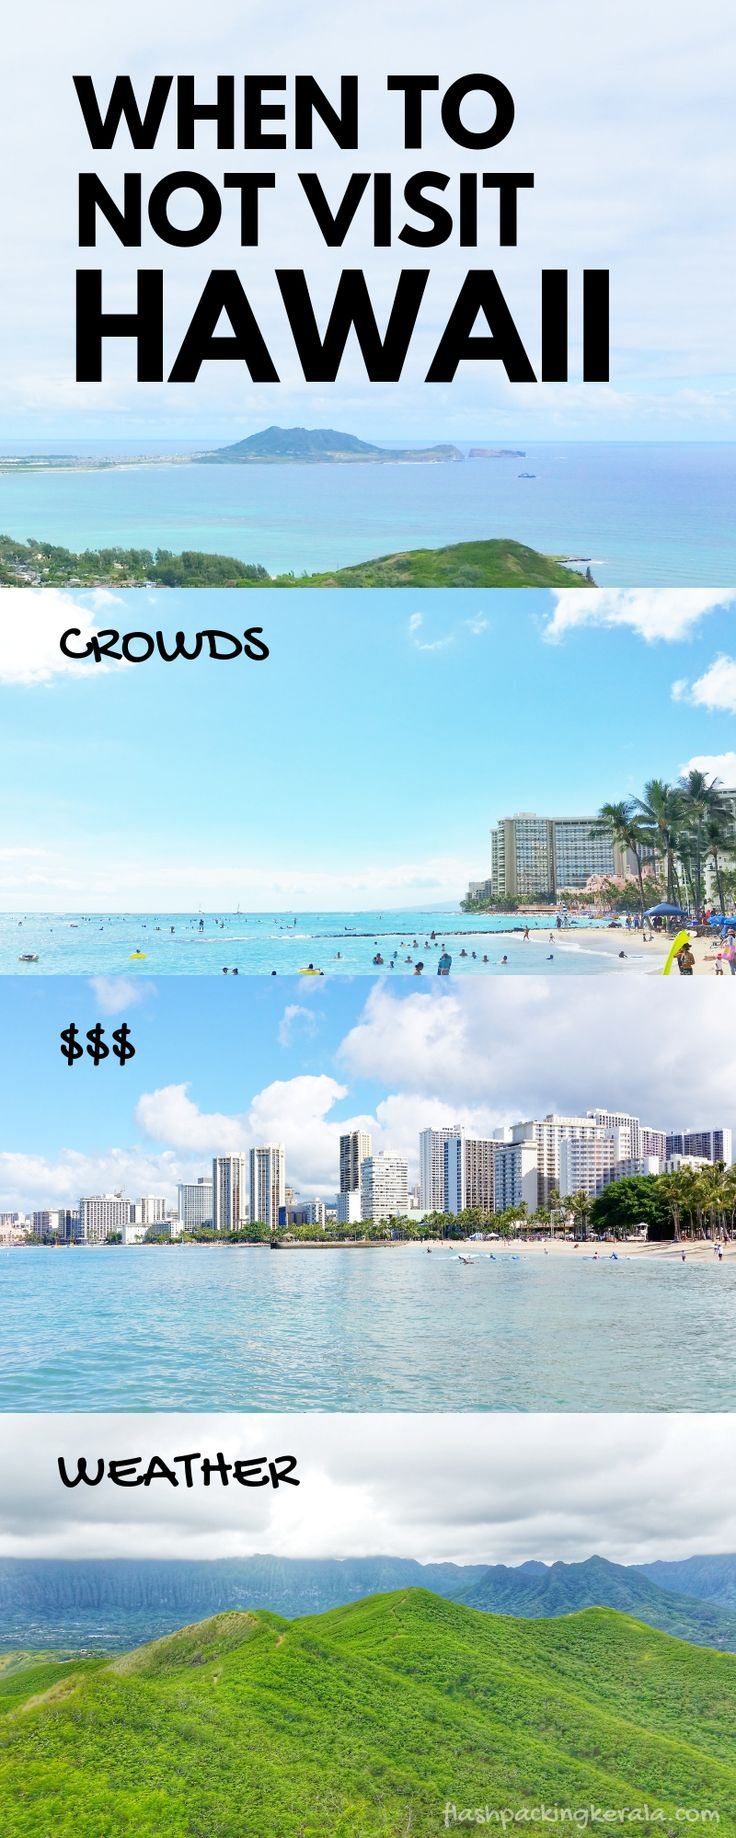 WORST time to visit Hawaii?! (get public health updates